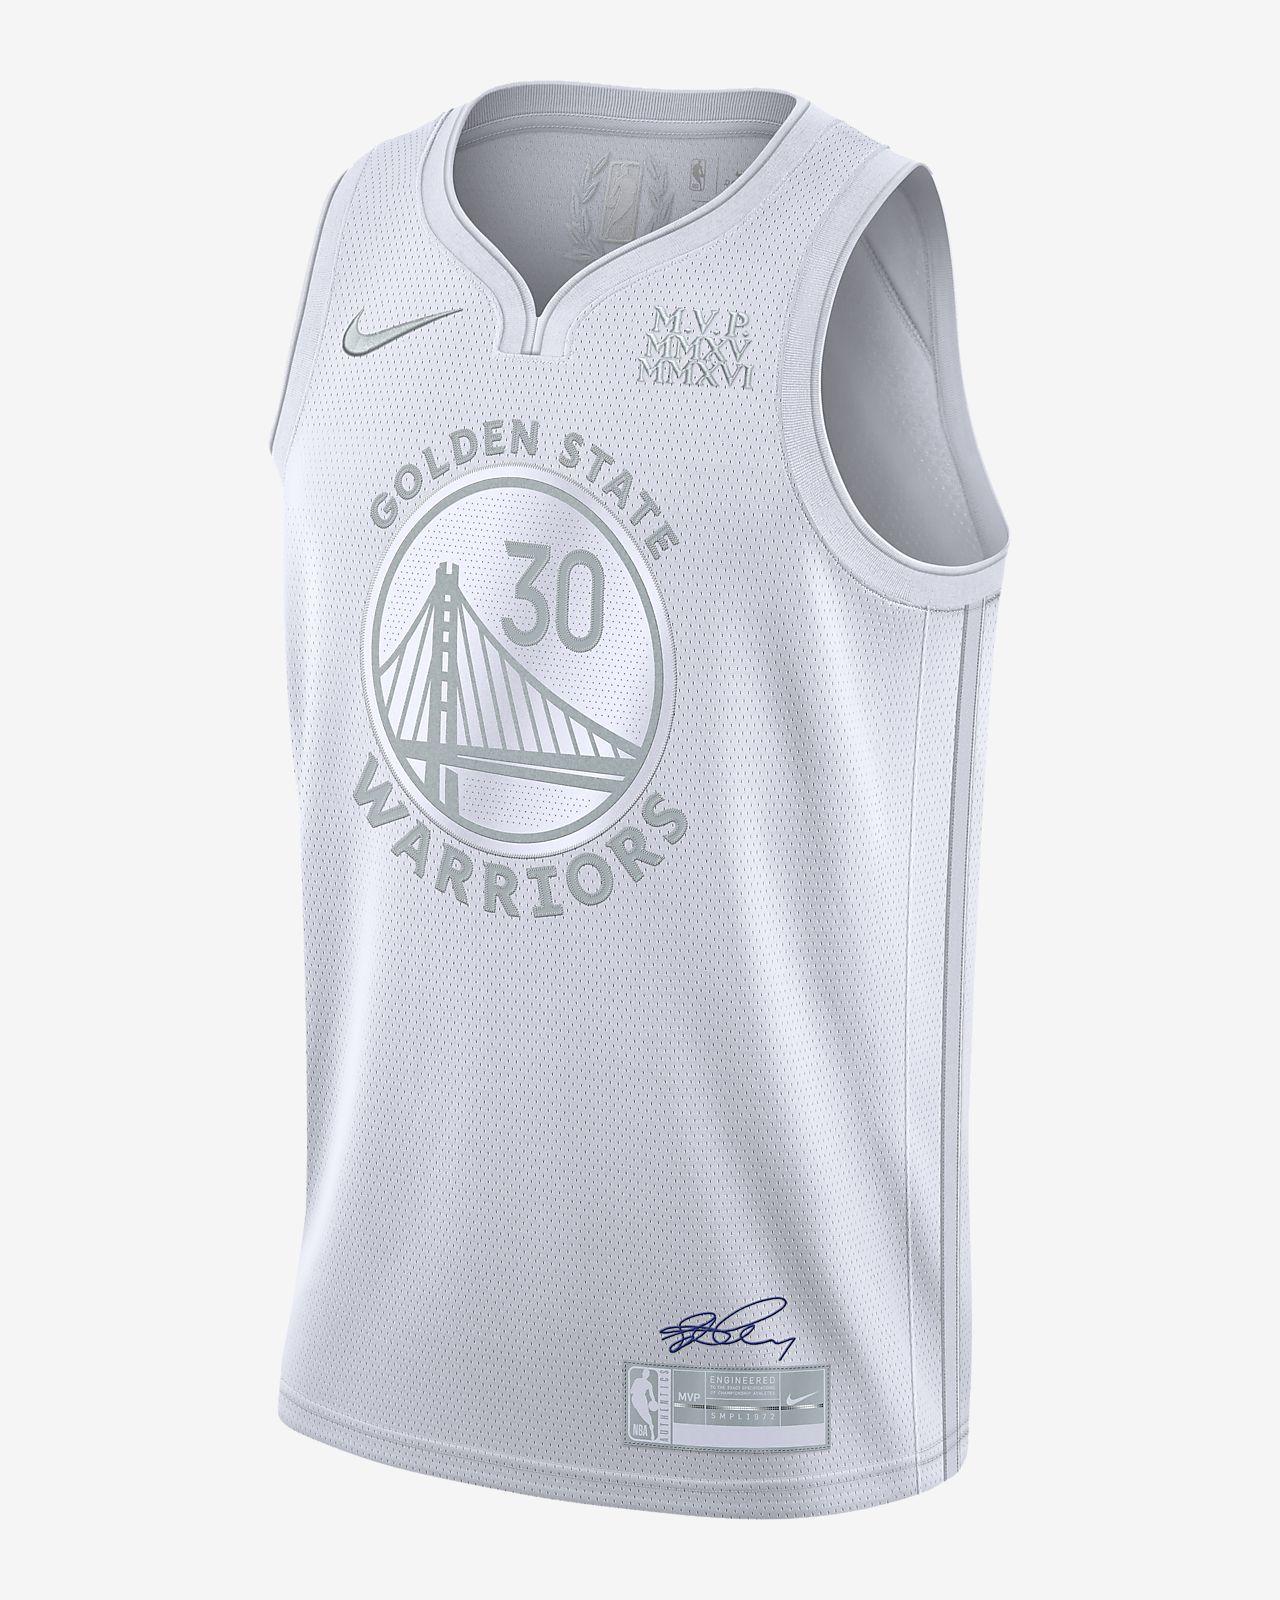 Basketball Jerseys Vests Tops+Shorts James Stephen Curry Jordan sportswear